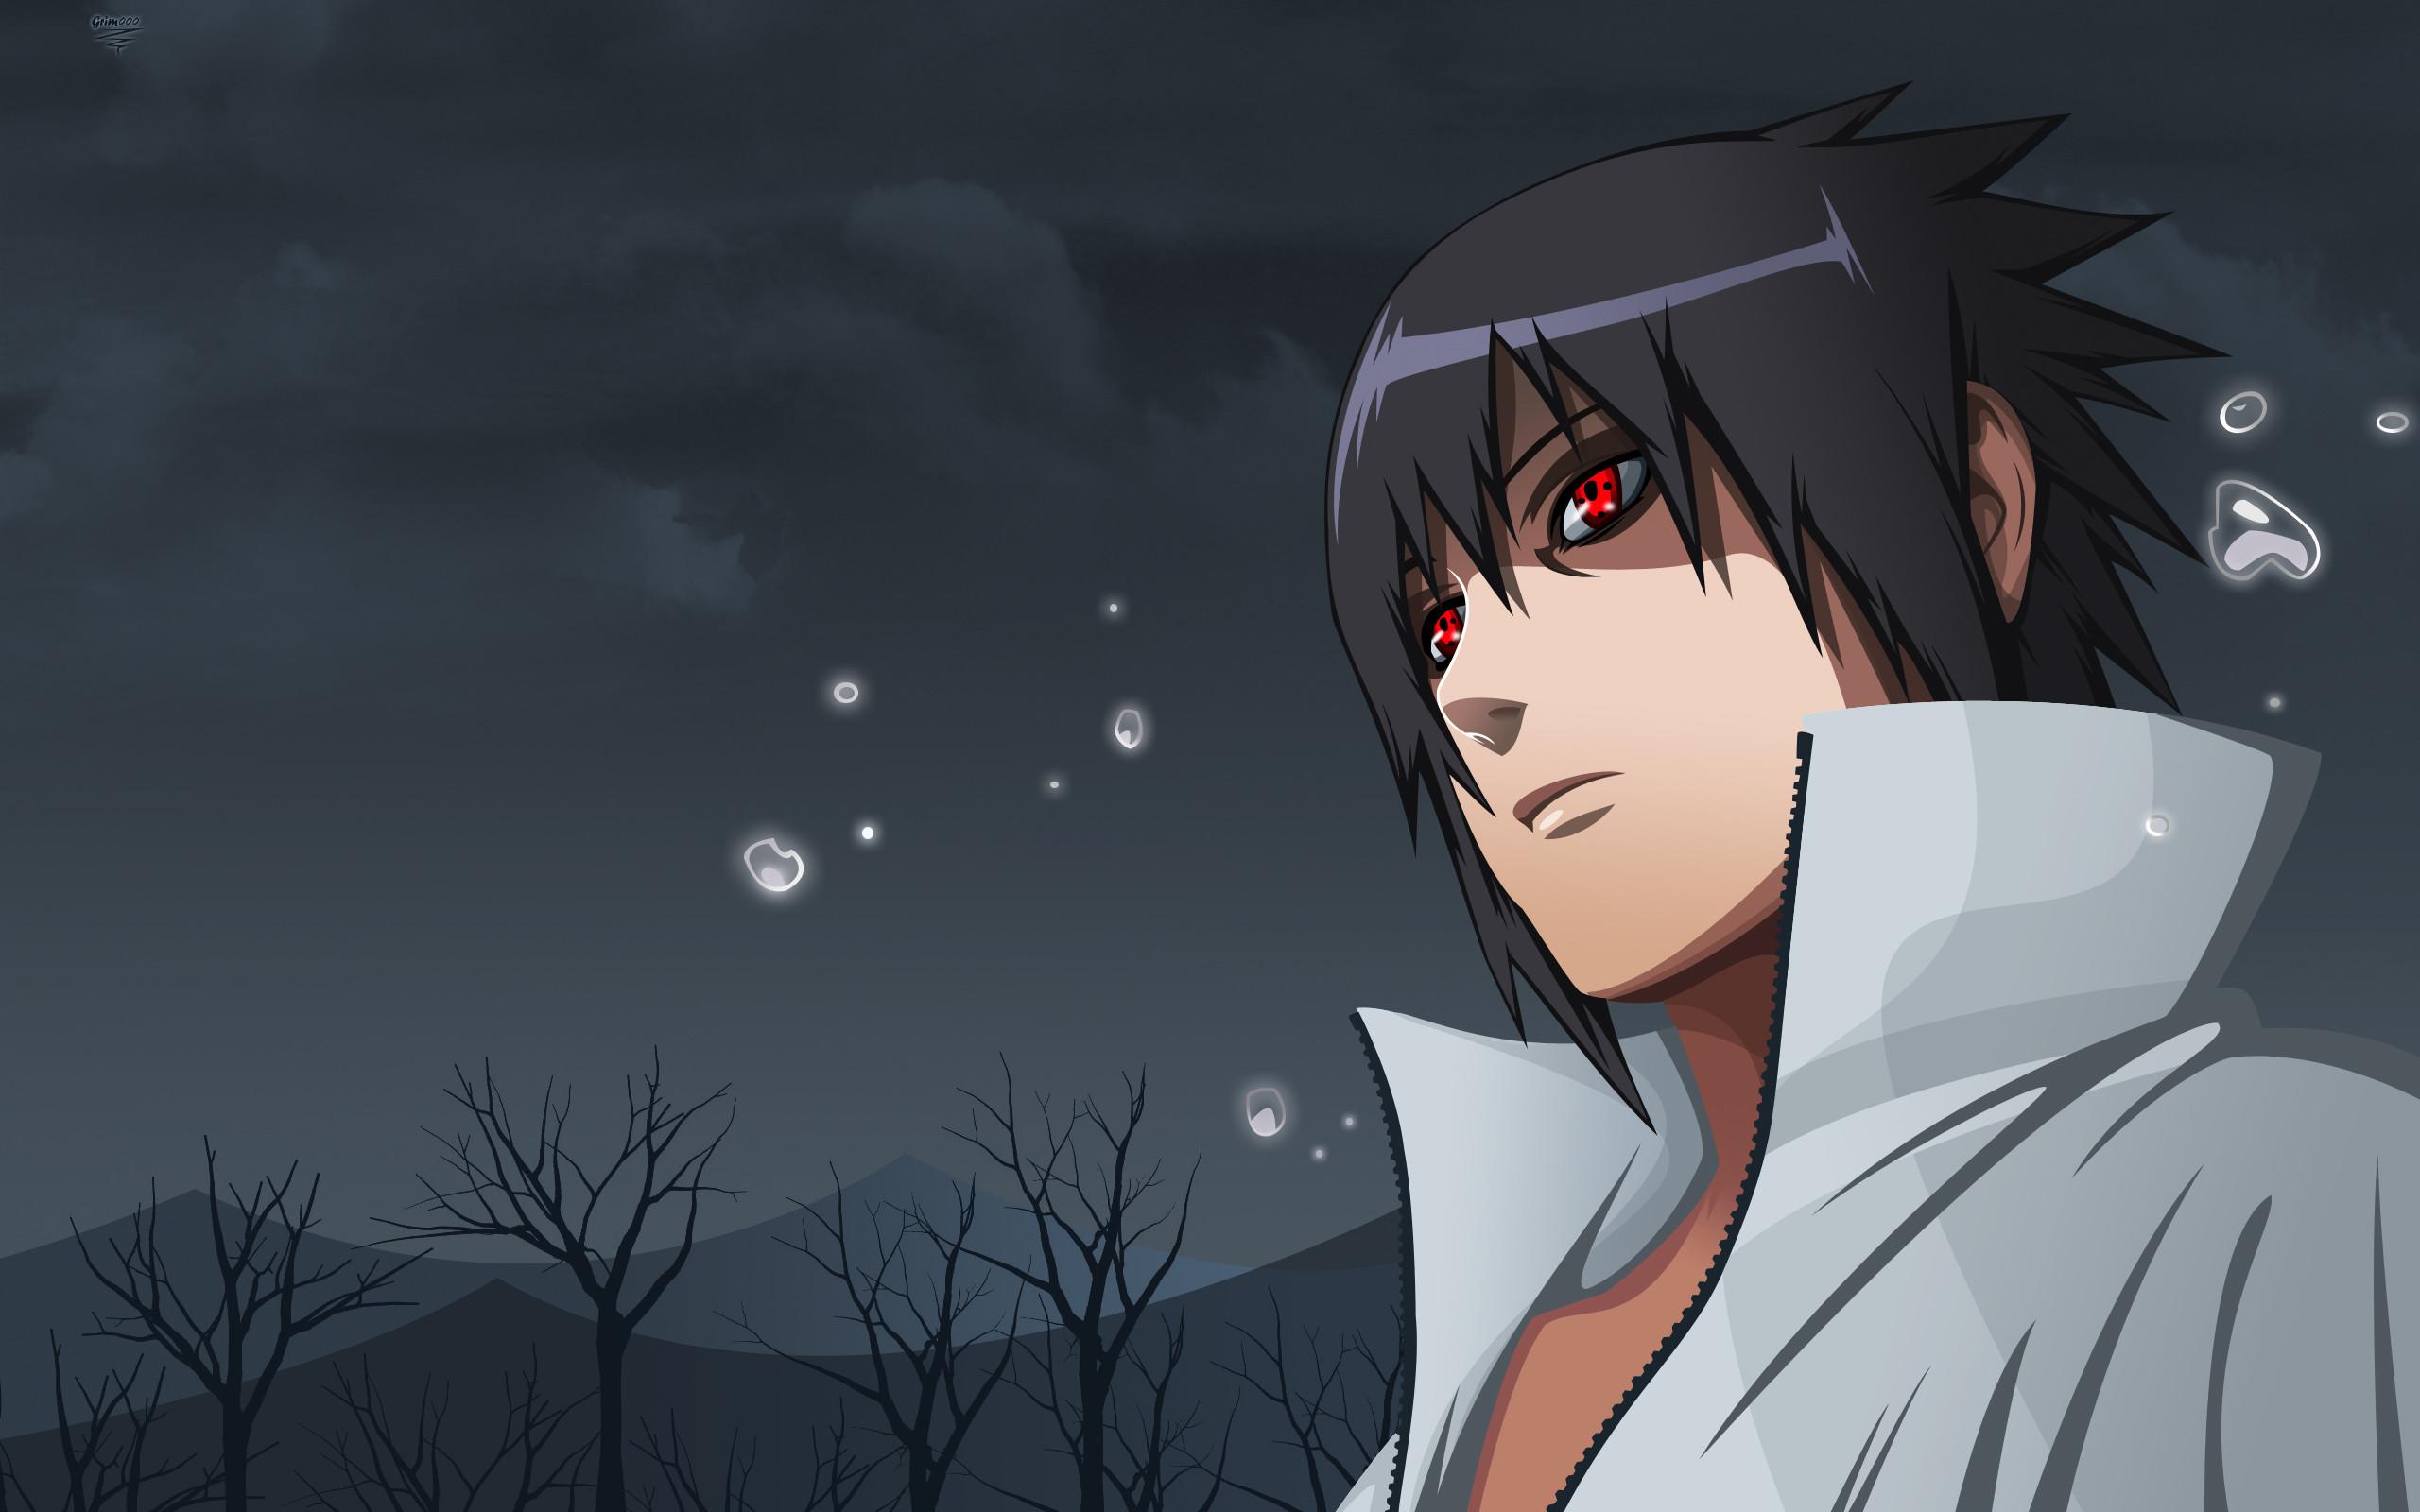 Download Sasuke Uchiha Wallpaper Widescreen #93112 px 860.52 KB  Character